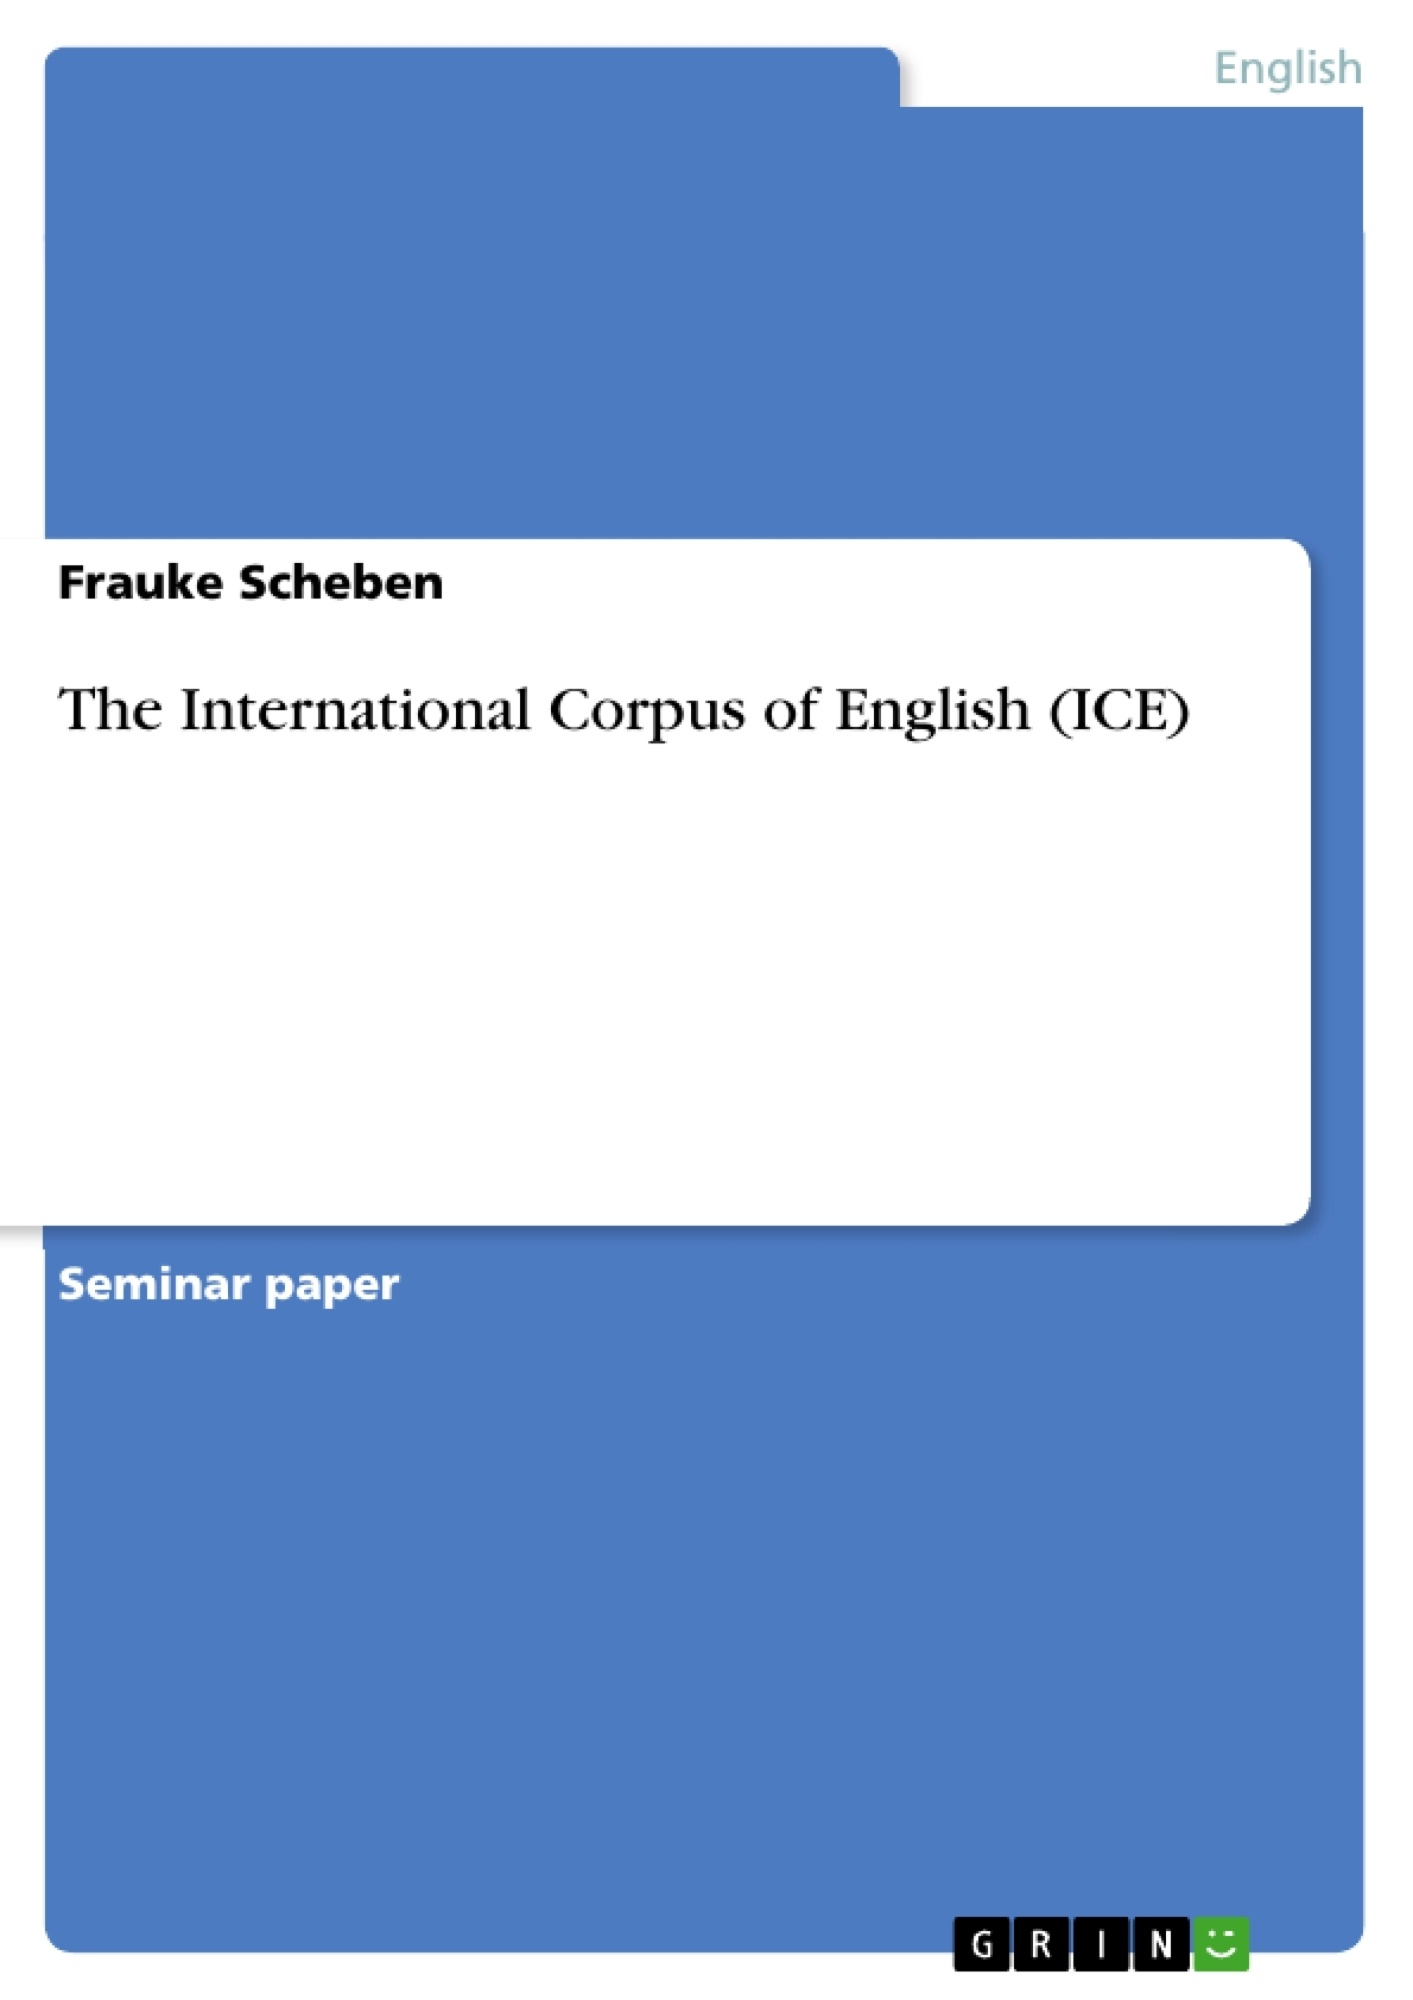 Title: The International Corpus of English (ICE)